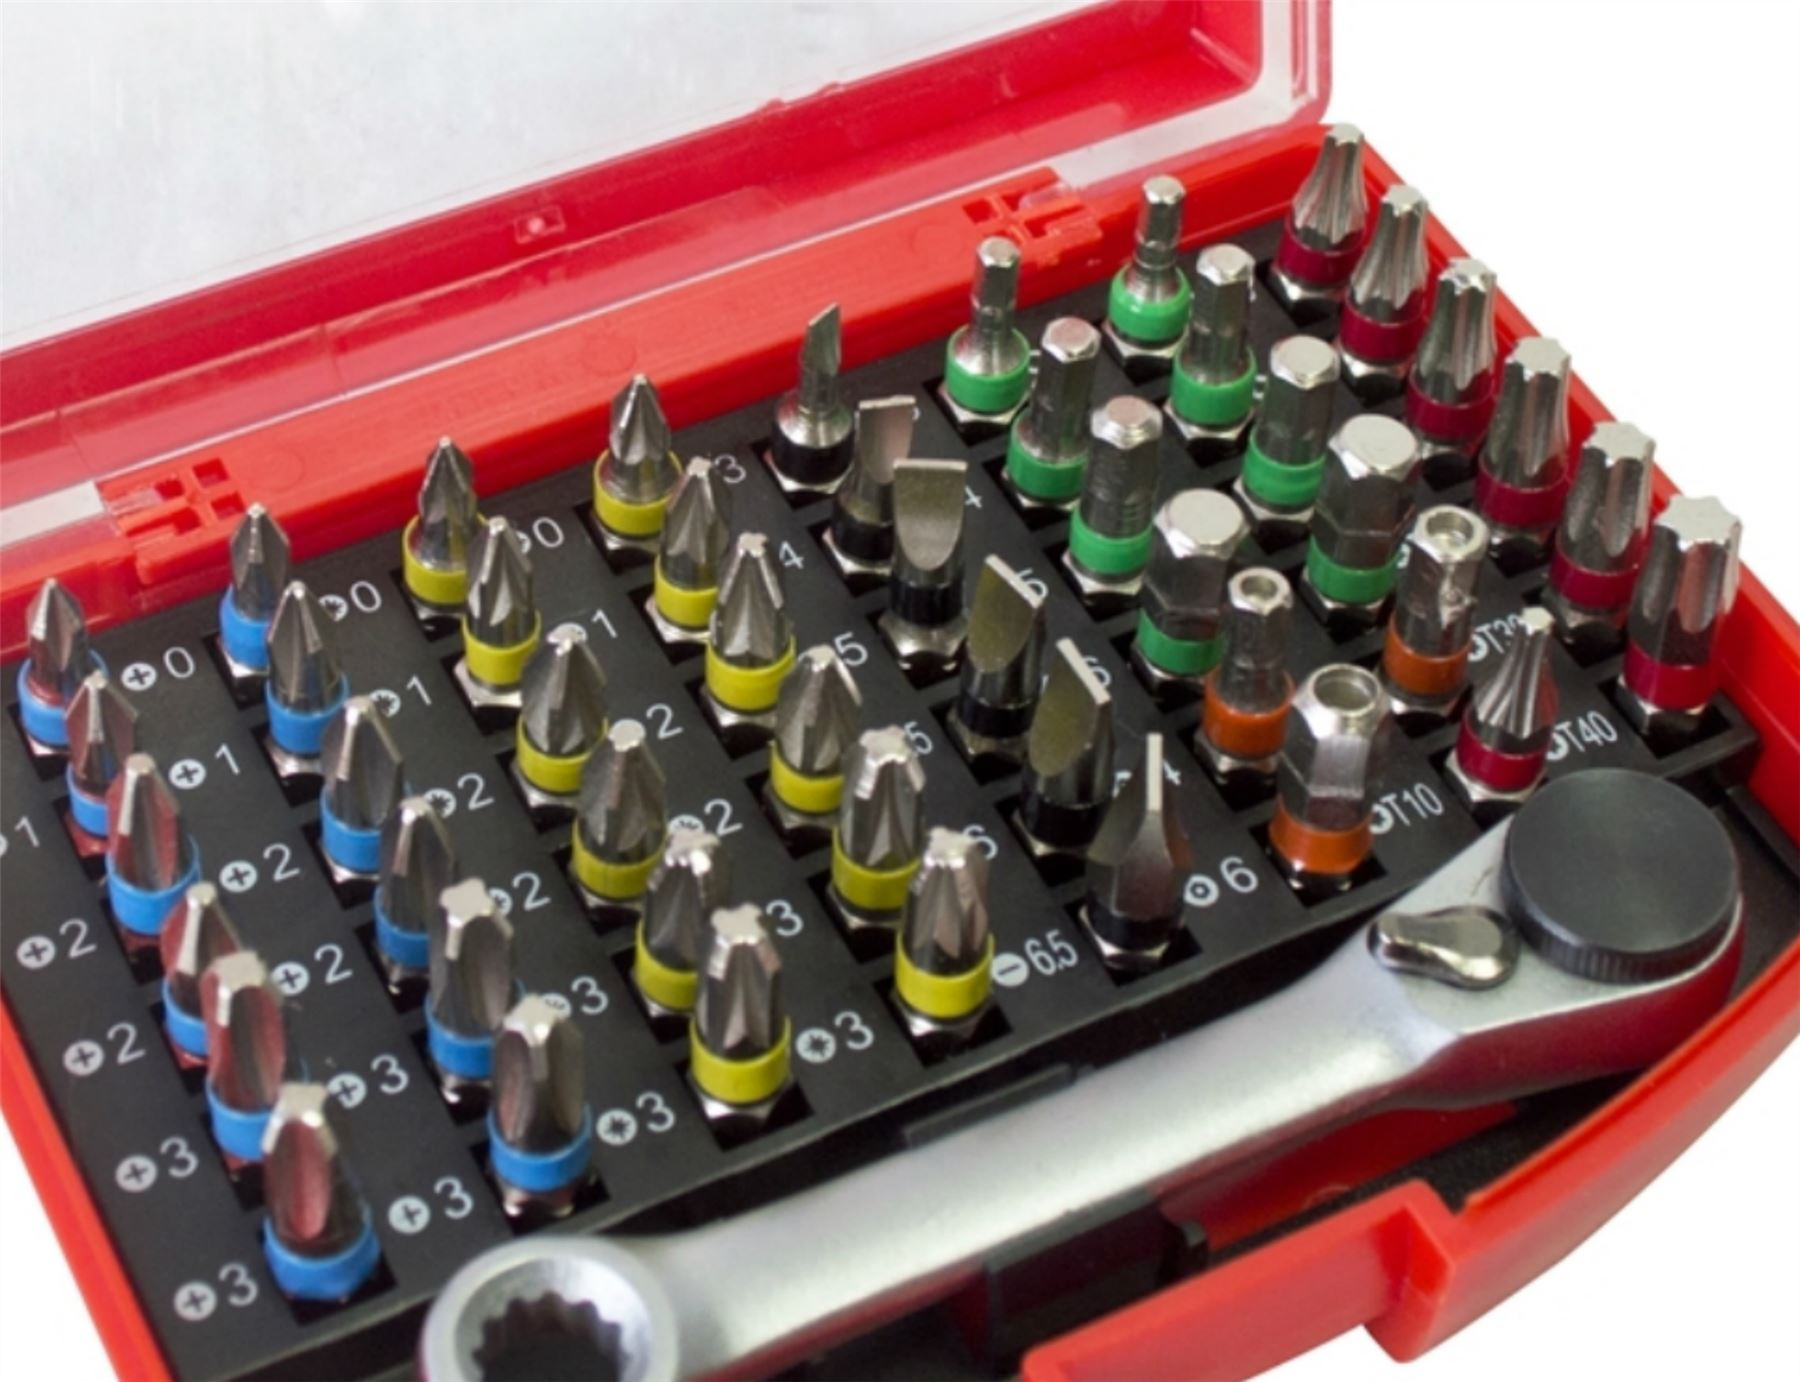 49pc Colour Coded Screwdriver Bits Set Case Slotted Pozi Hex Phillips Torx Box